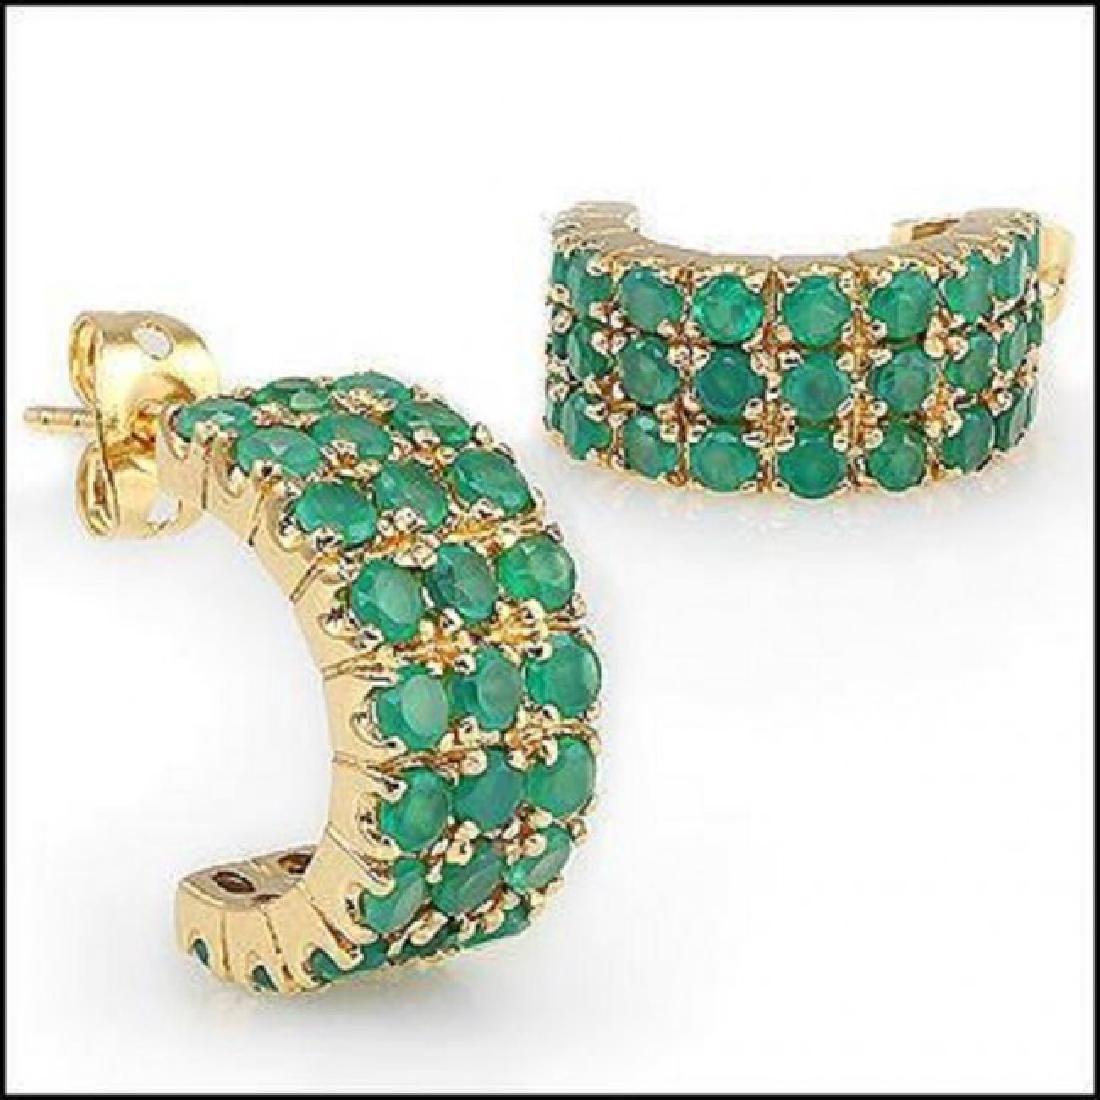 Jewelry Sale 6.02 CT Green Agate Stud Designer Earrings